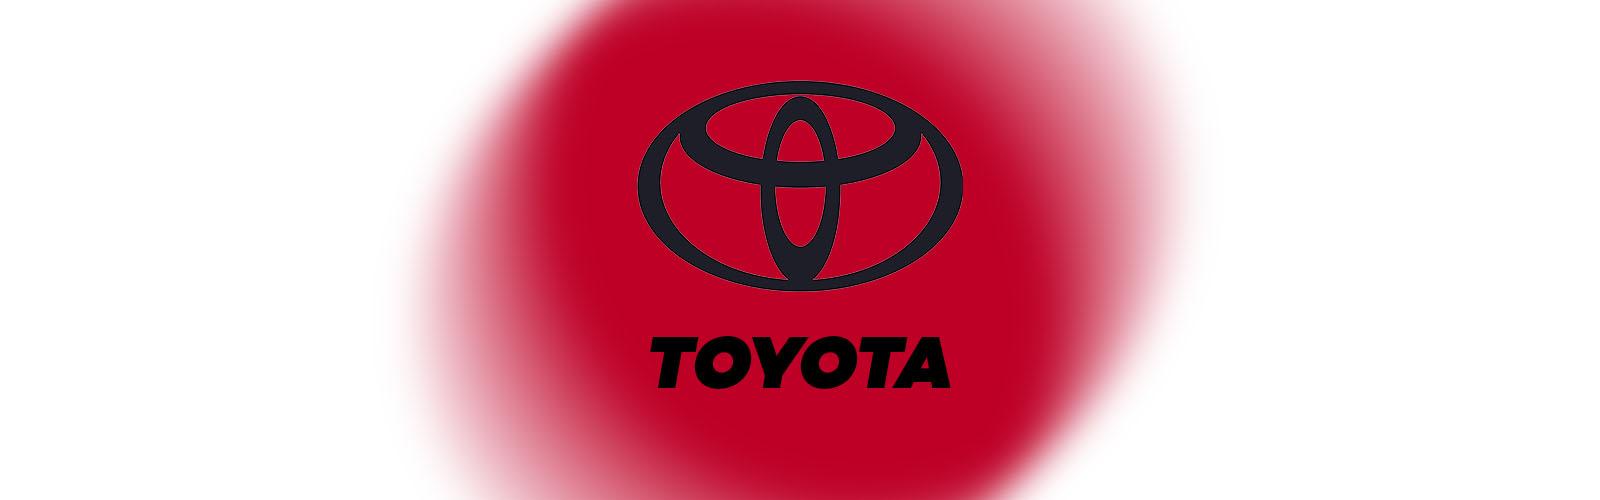 toyota logo marque